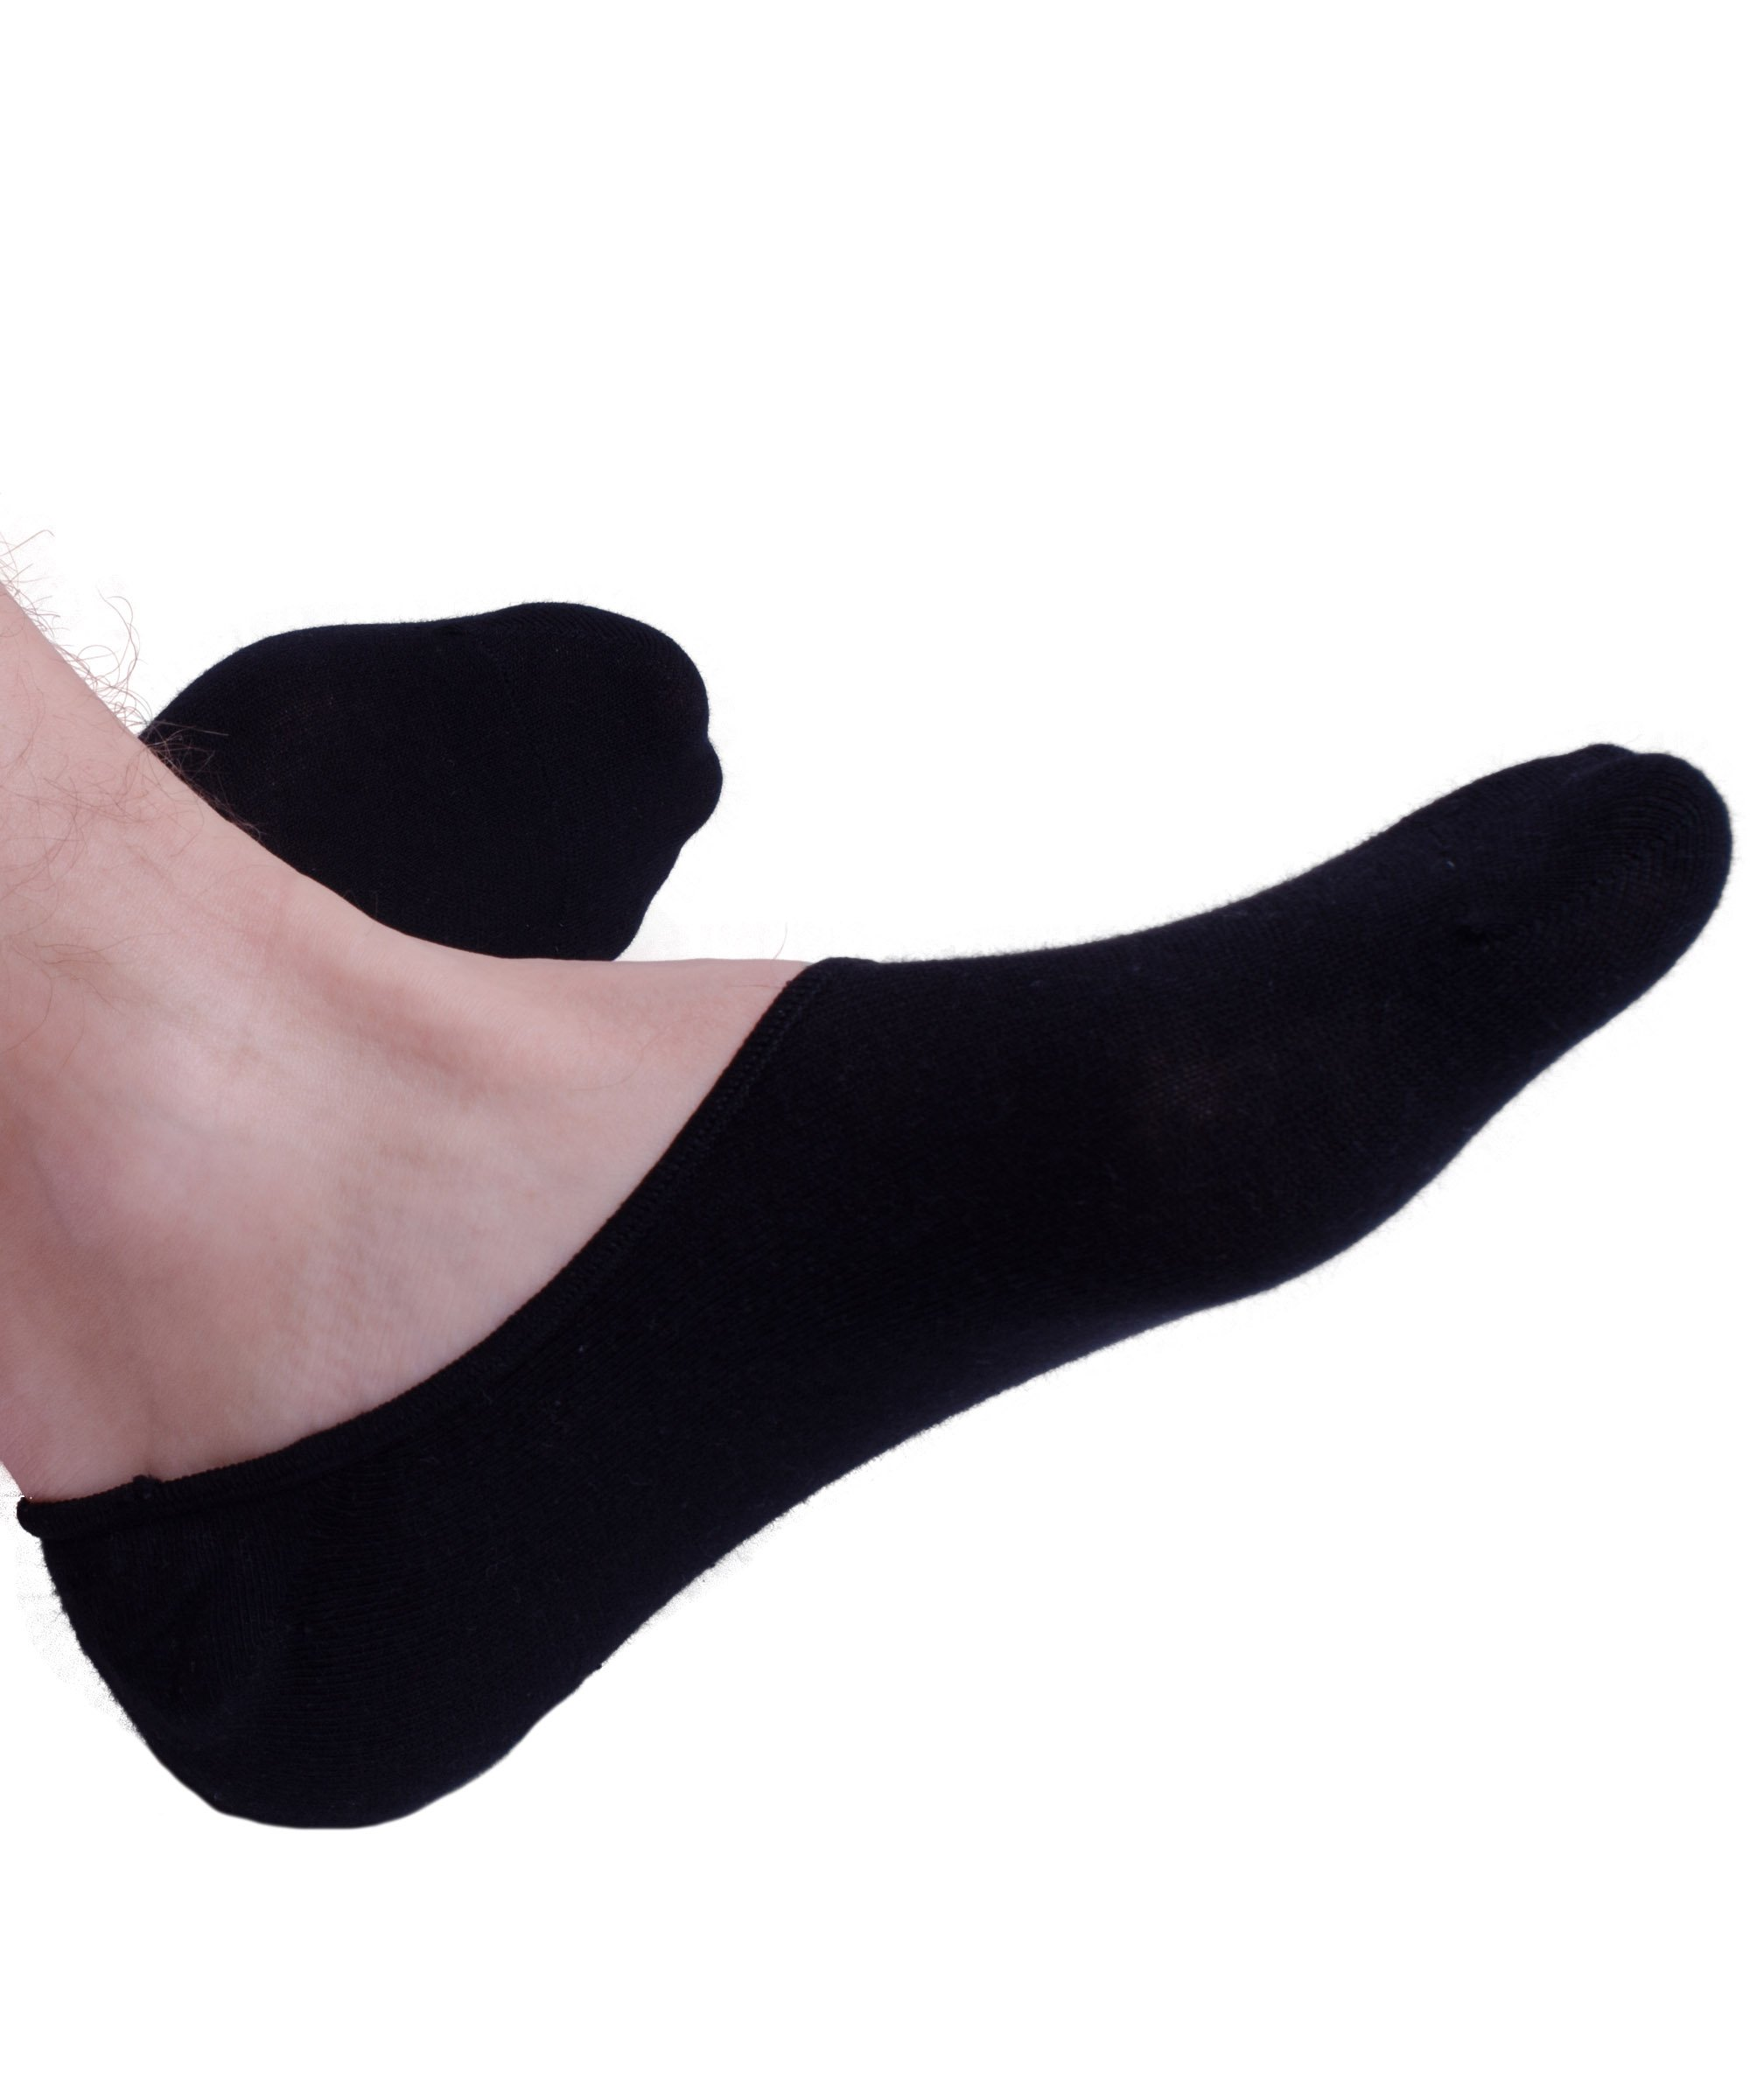 No Show Socks For Men 3pk Quality Cotton Lge Heel Grip Non Slip Black, Medium